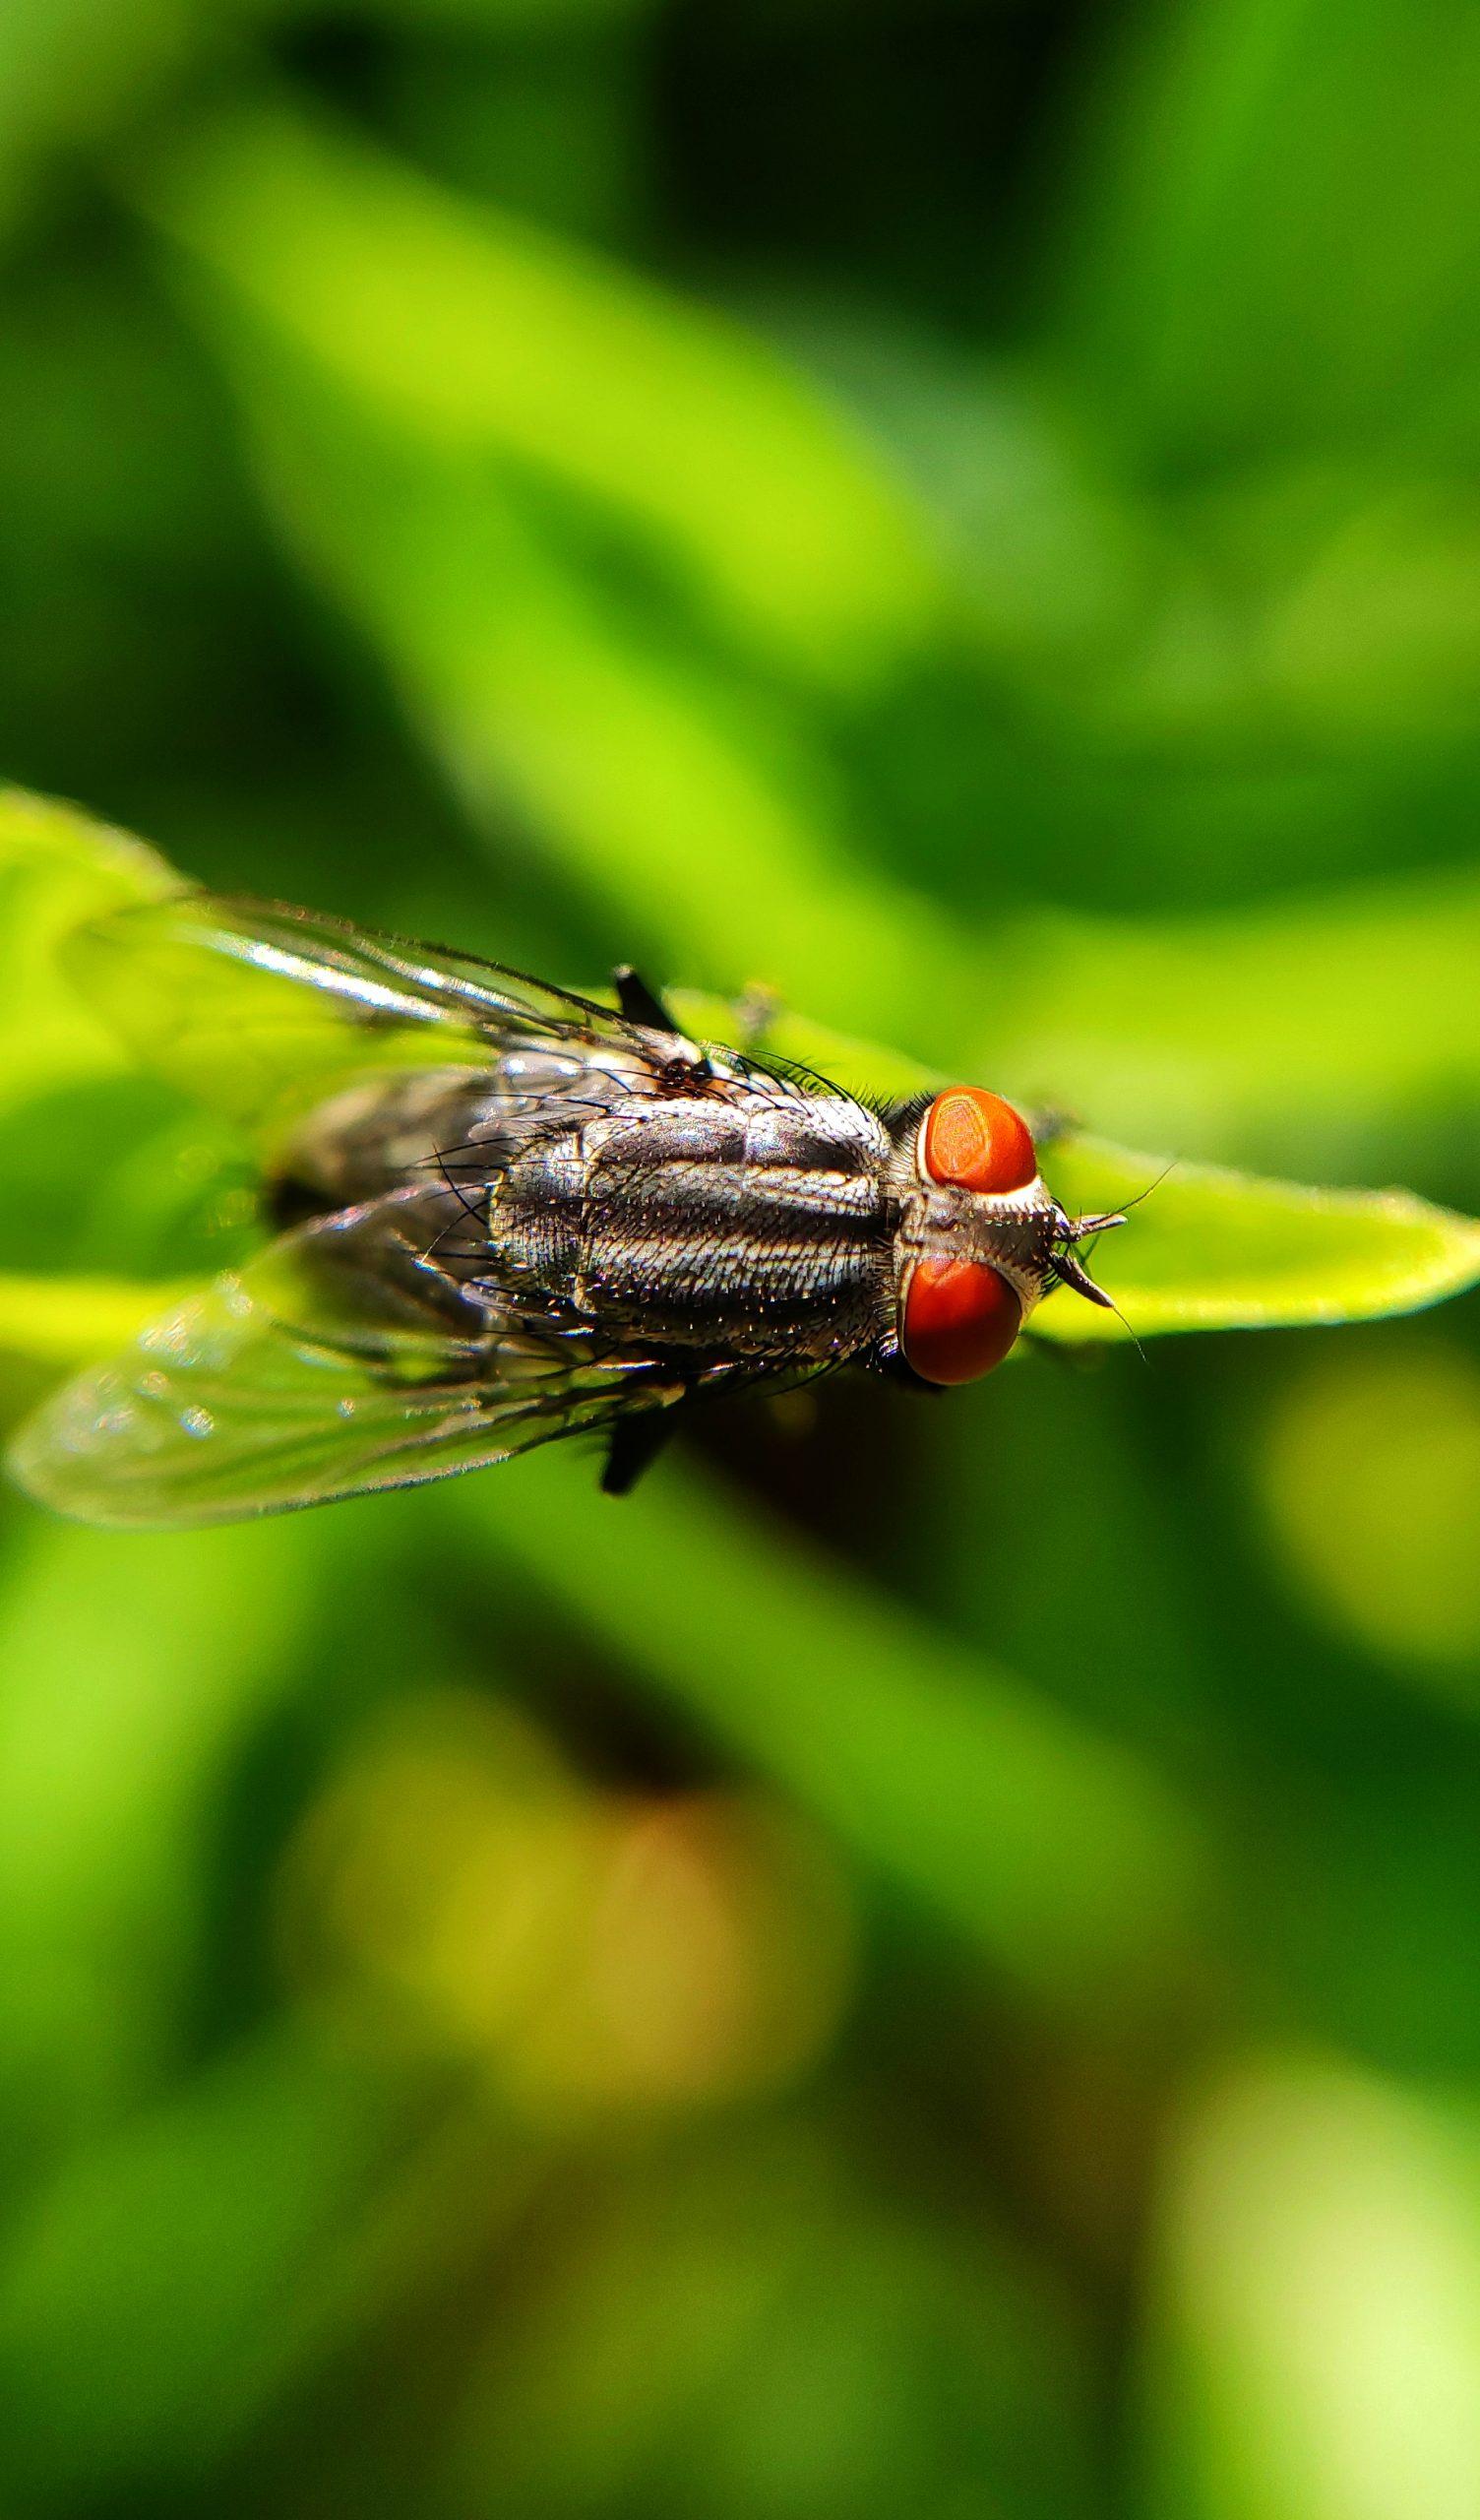 Housefly macro view